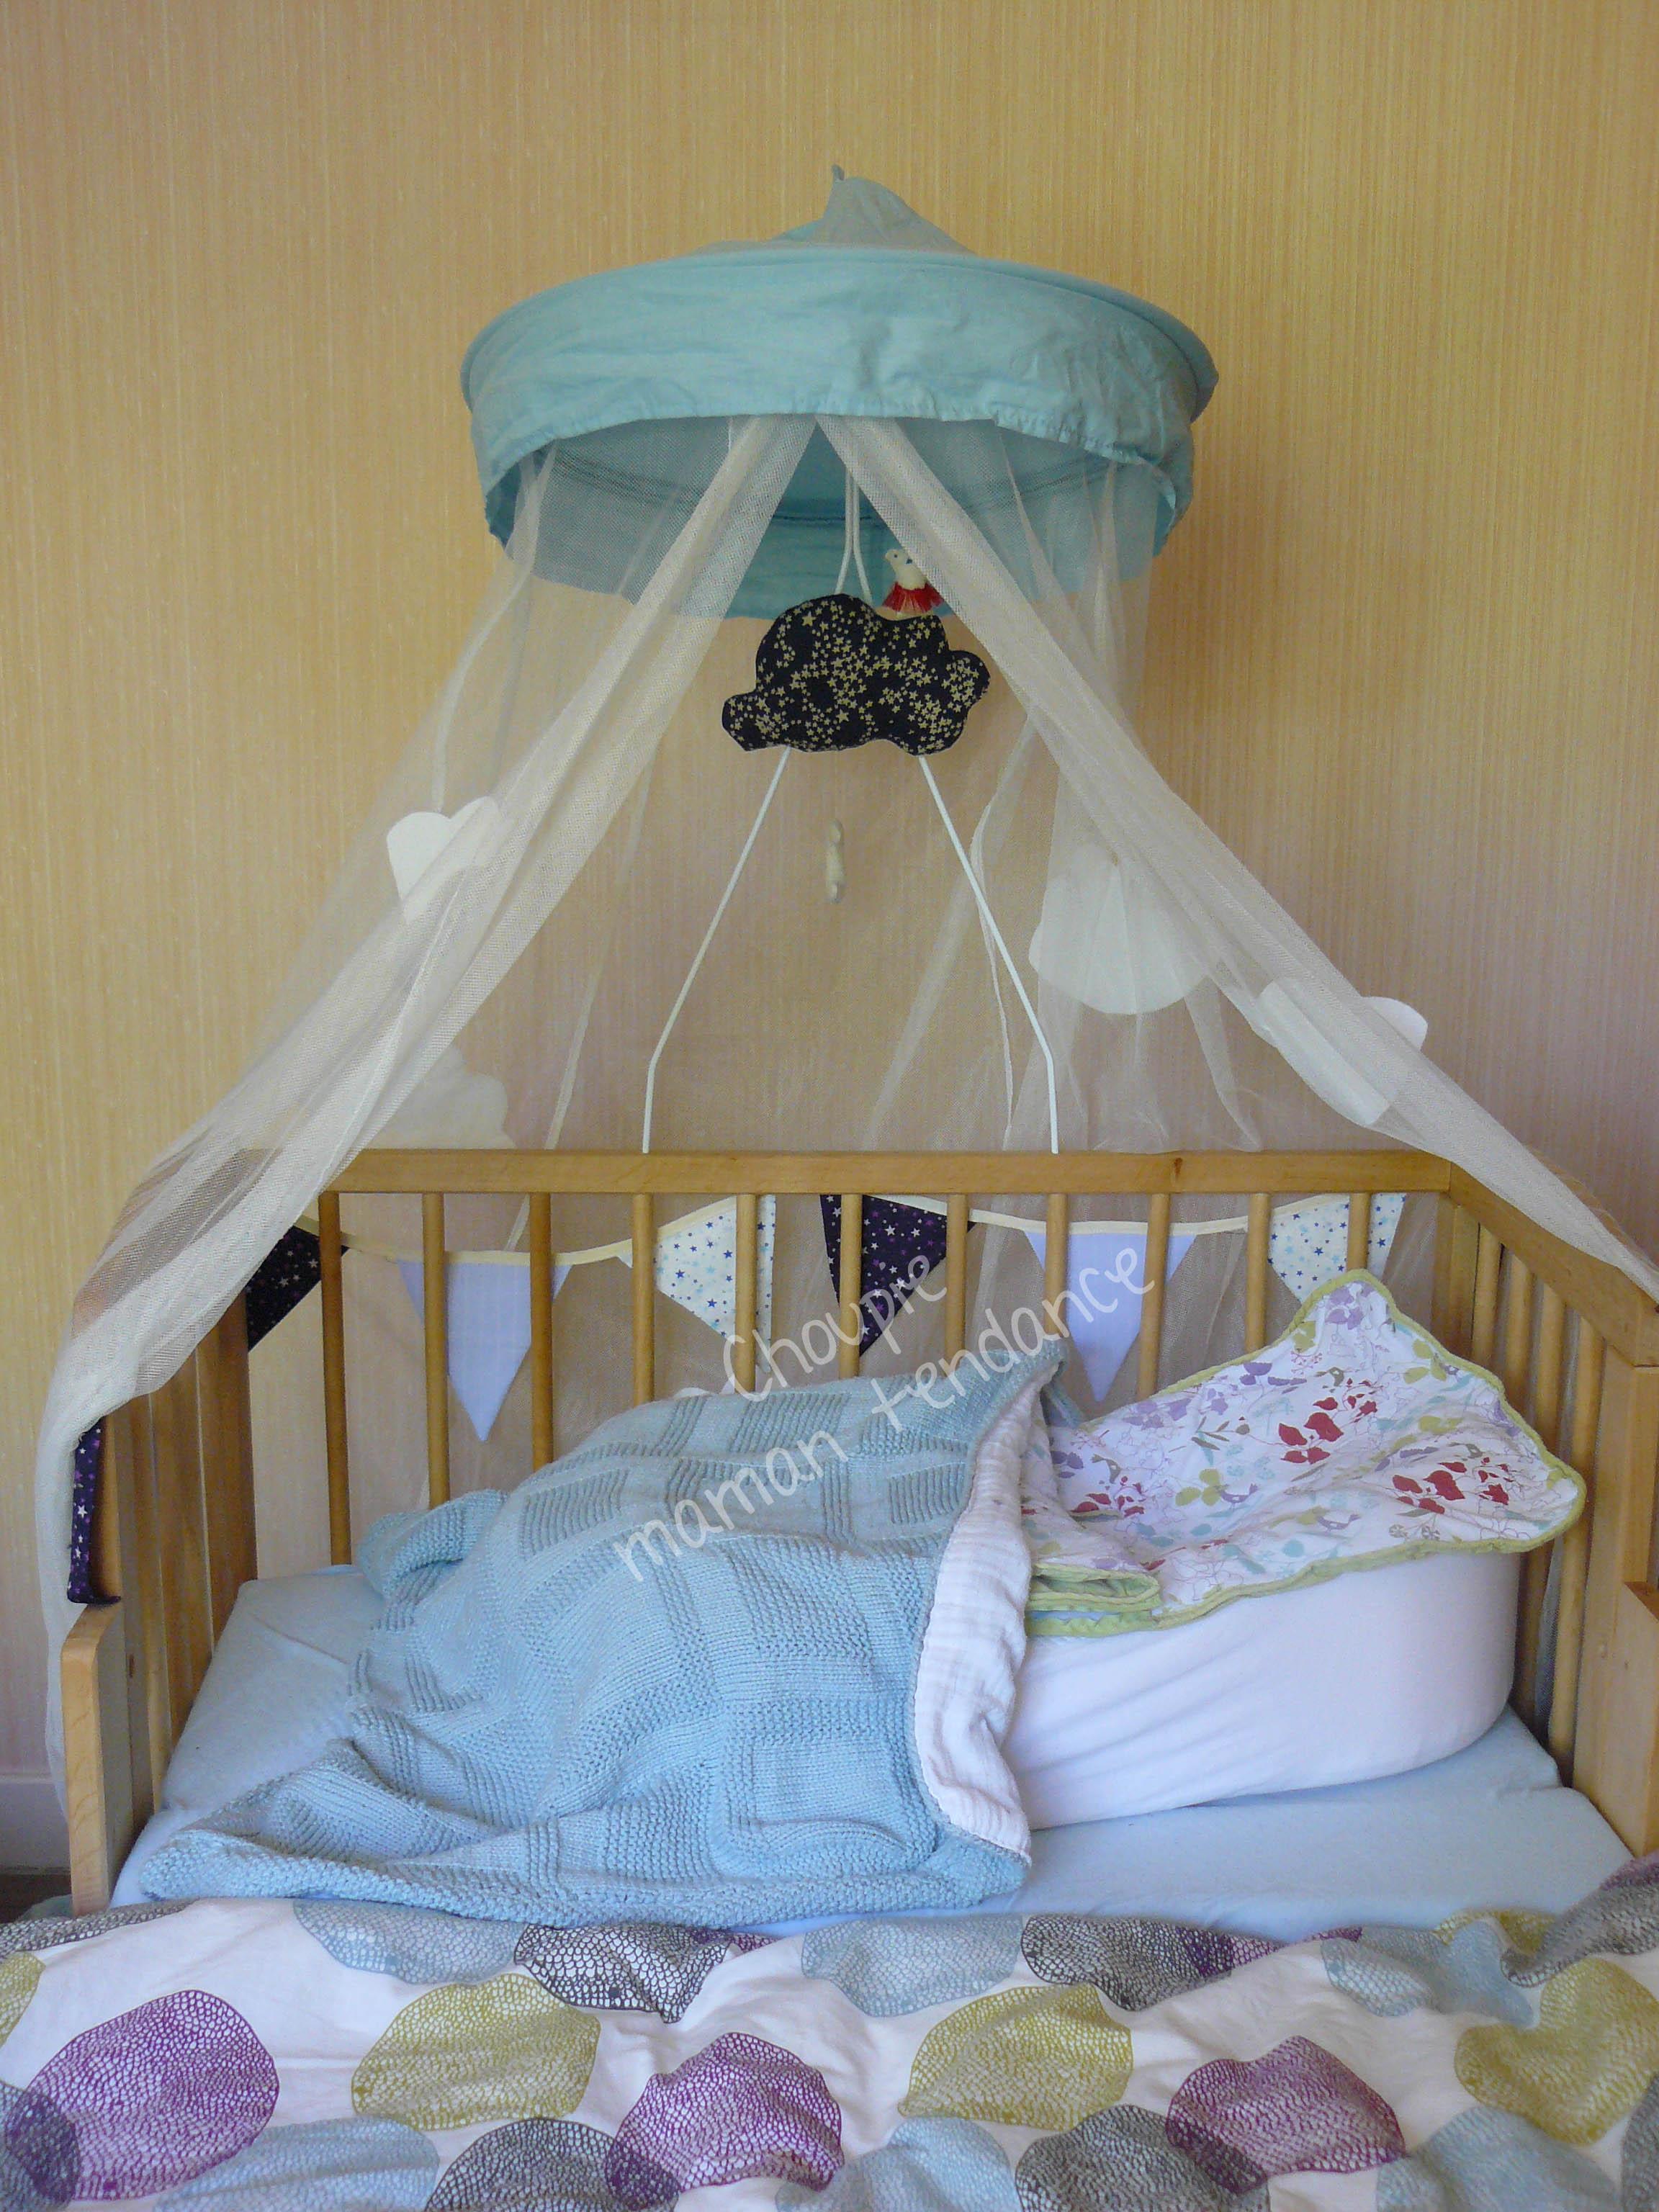 le berceau cododo b b s tendances. Black Bedroom Furniture Sets. Home Design Ideas